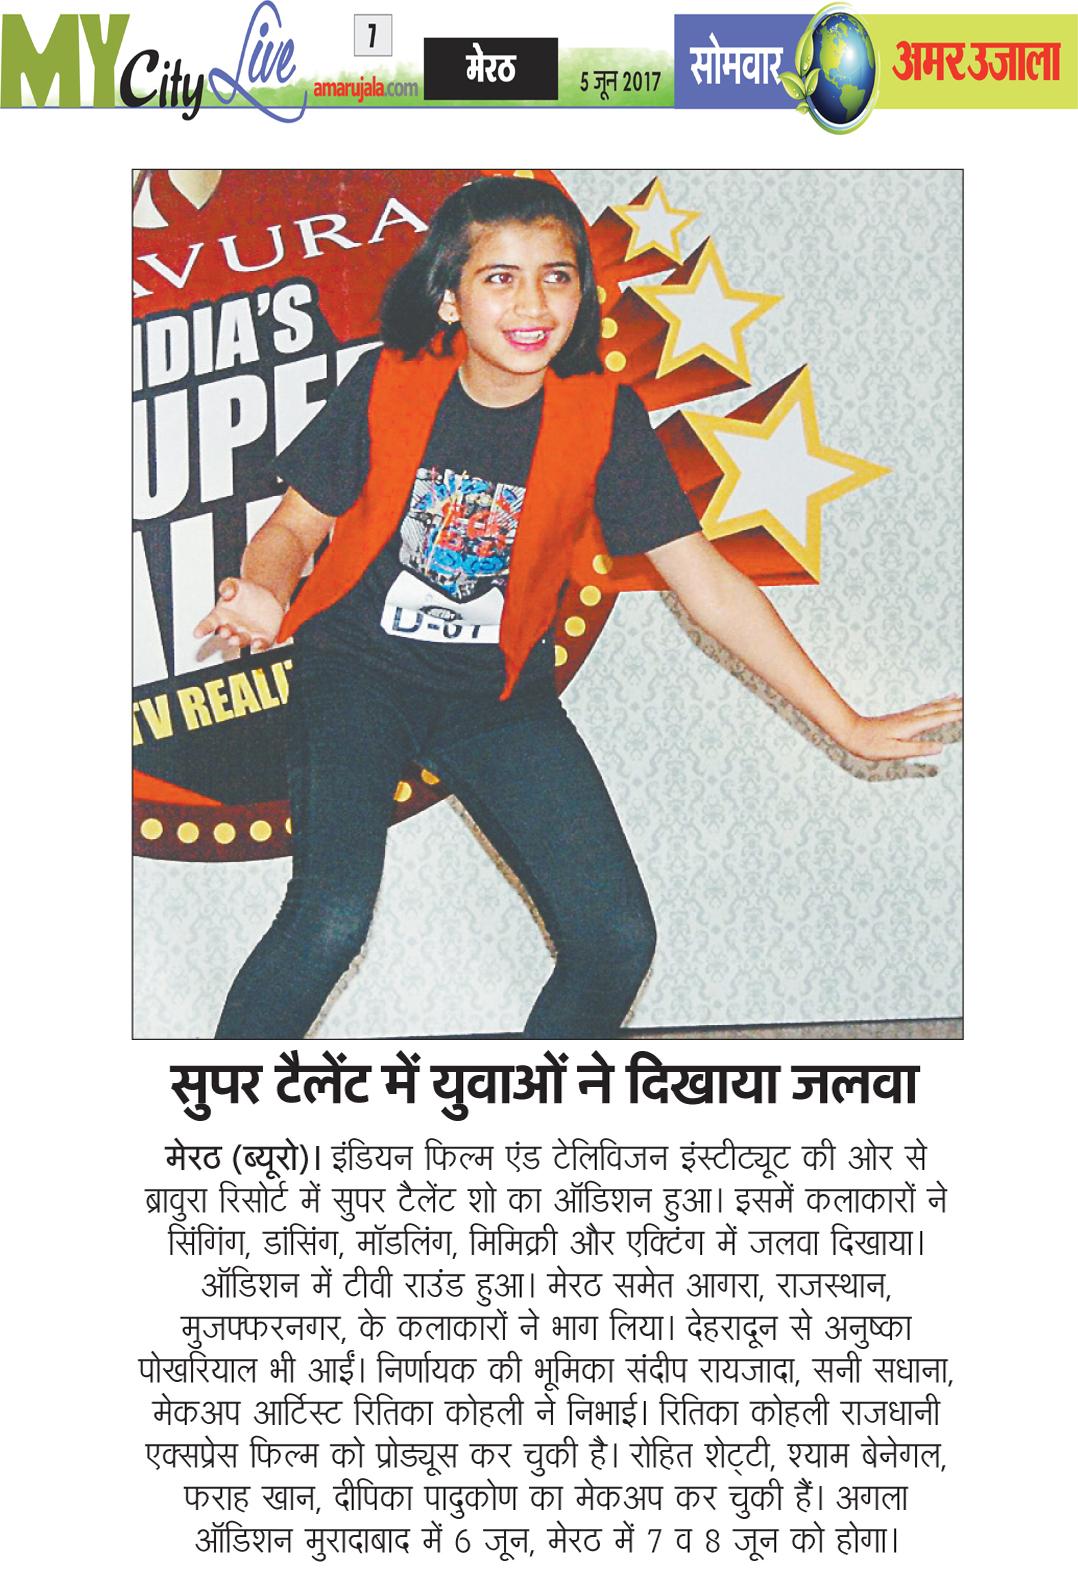 India's Super Talent Amar Ujala News